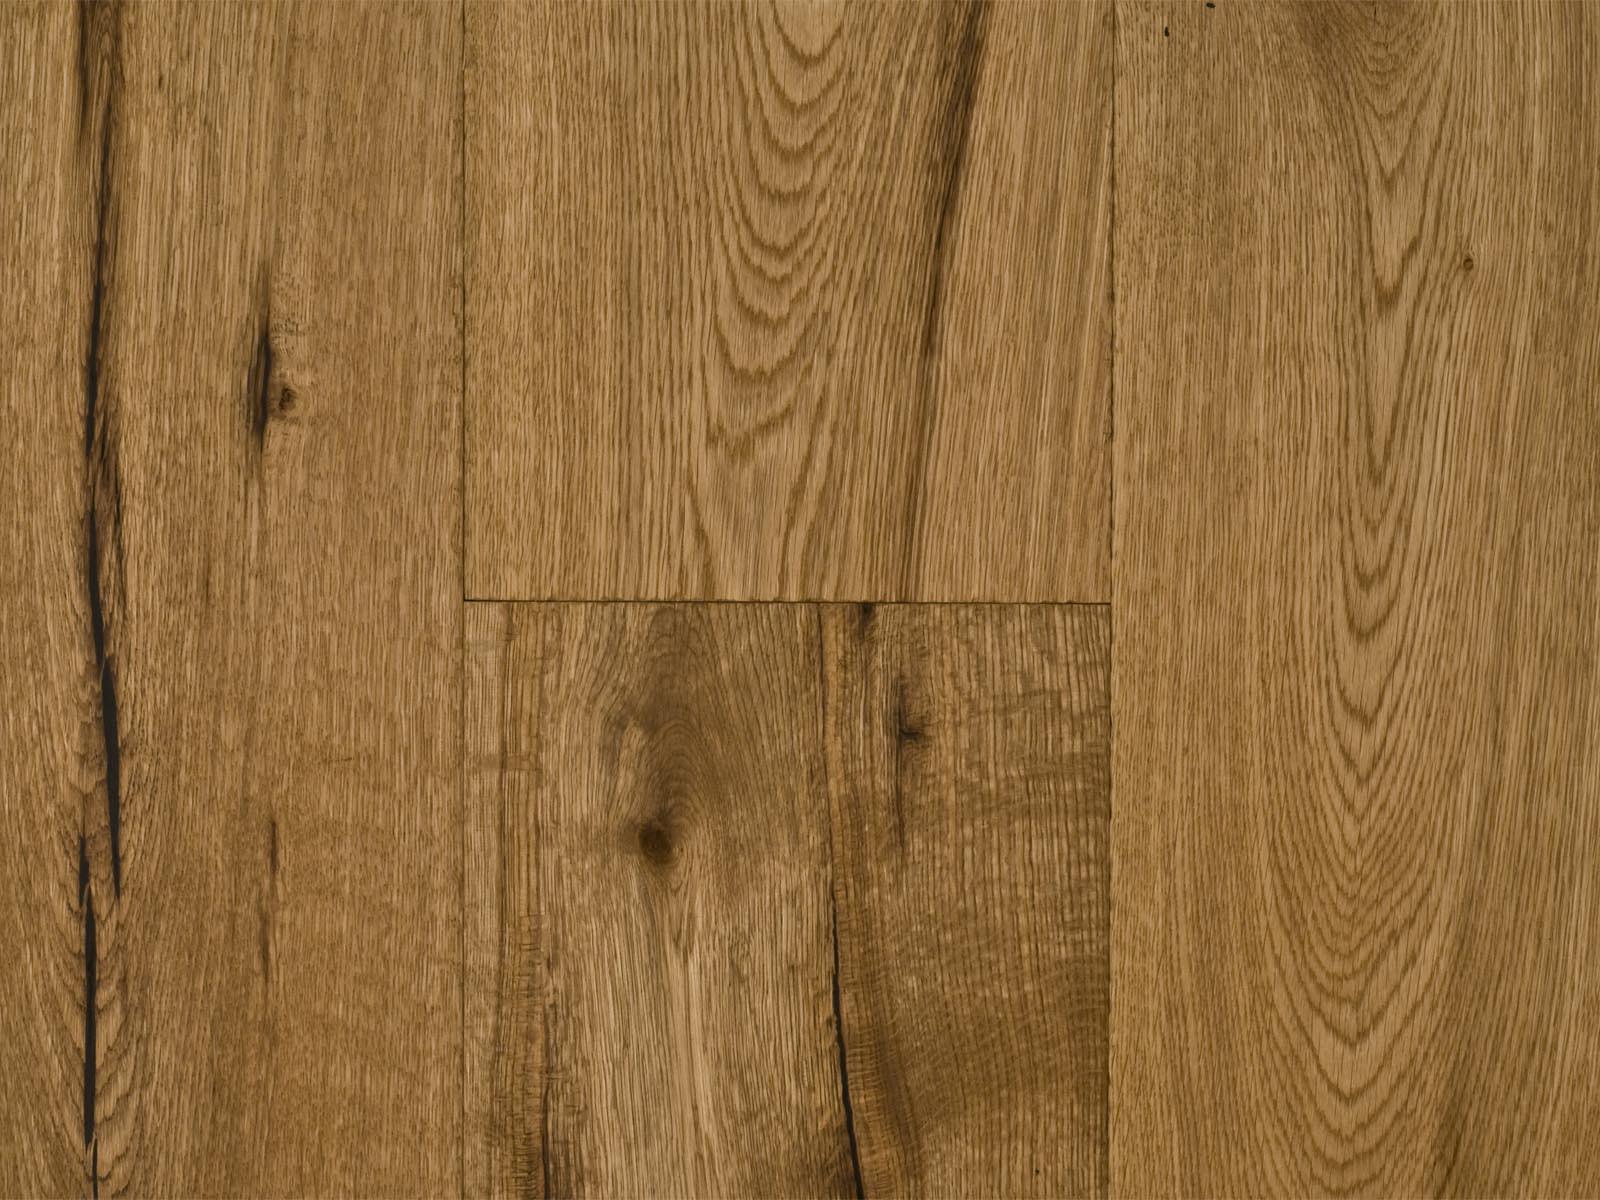 engineered hardwood flooring clearance closeout of duchateau hardwood flooring houston tx discount engineered wood throughout natural european oak